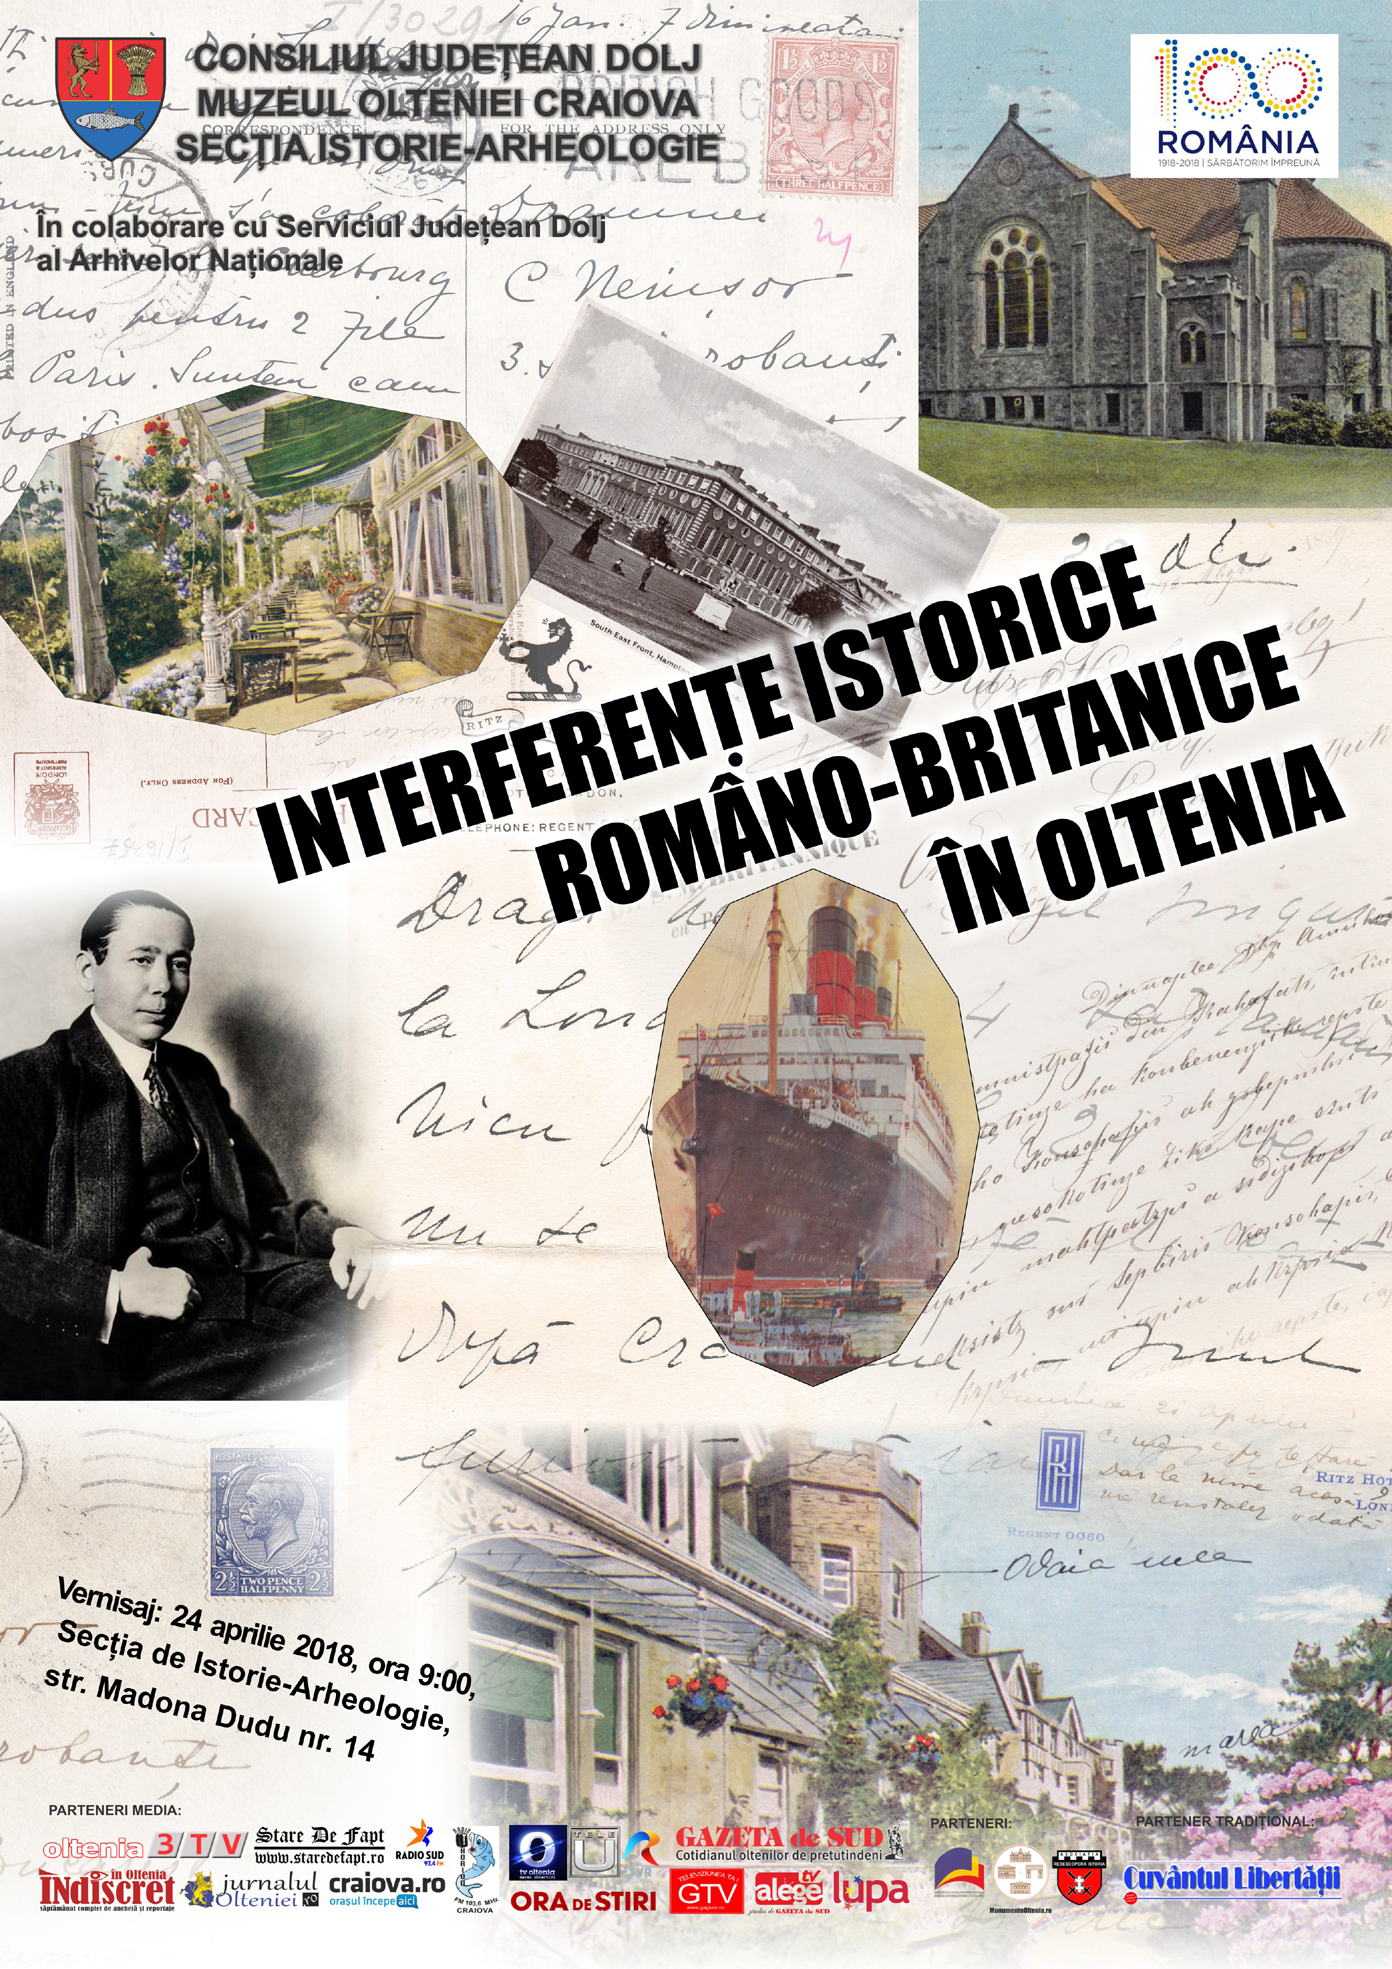 Craiova: Interferențe istorice româno-britanice în Oltenia